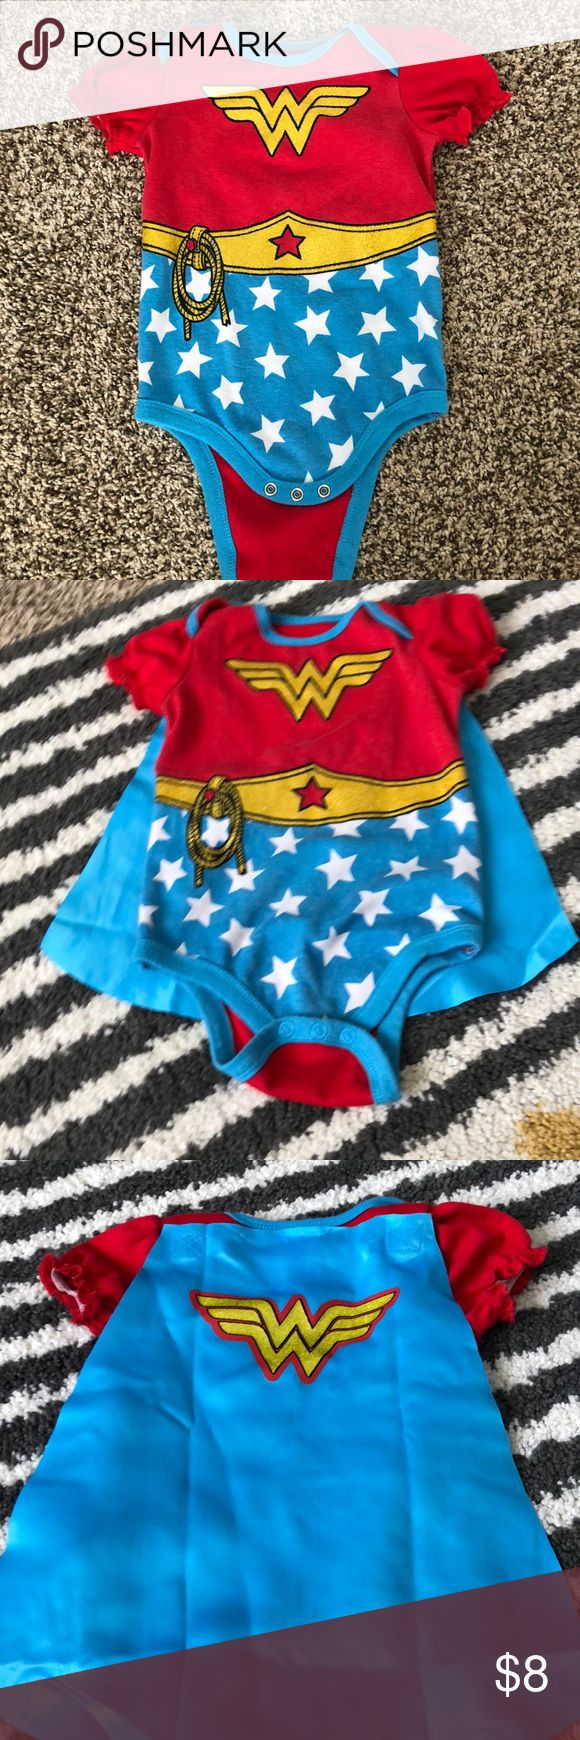 Wonder Woman onesie Super cute Wonder Woman outfit for baby! Costumes Superhero